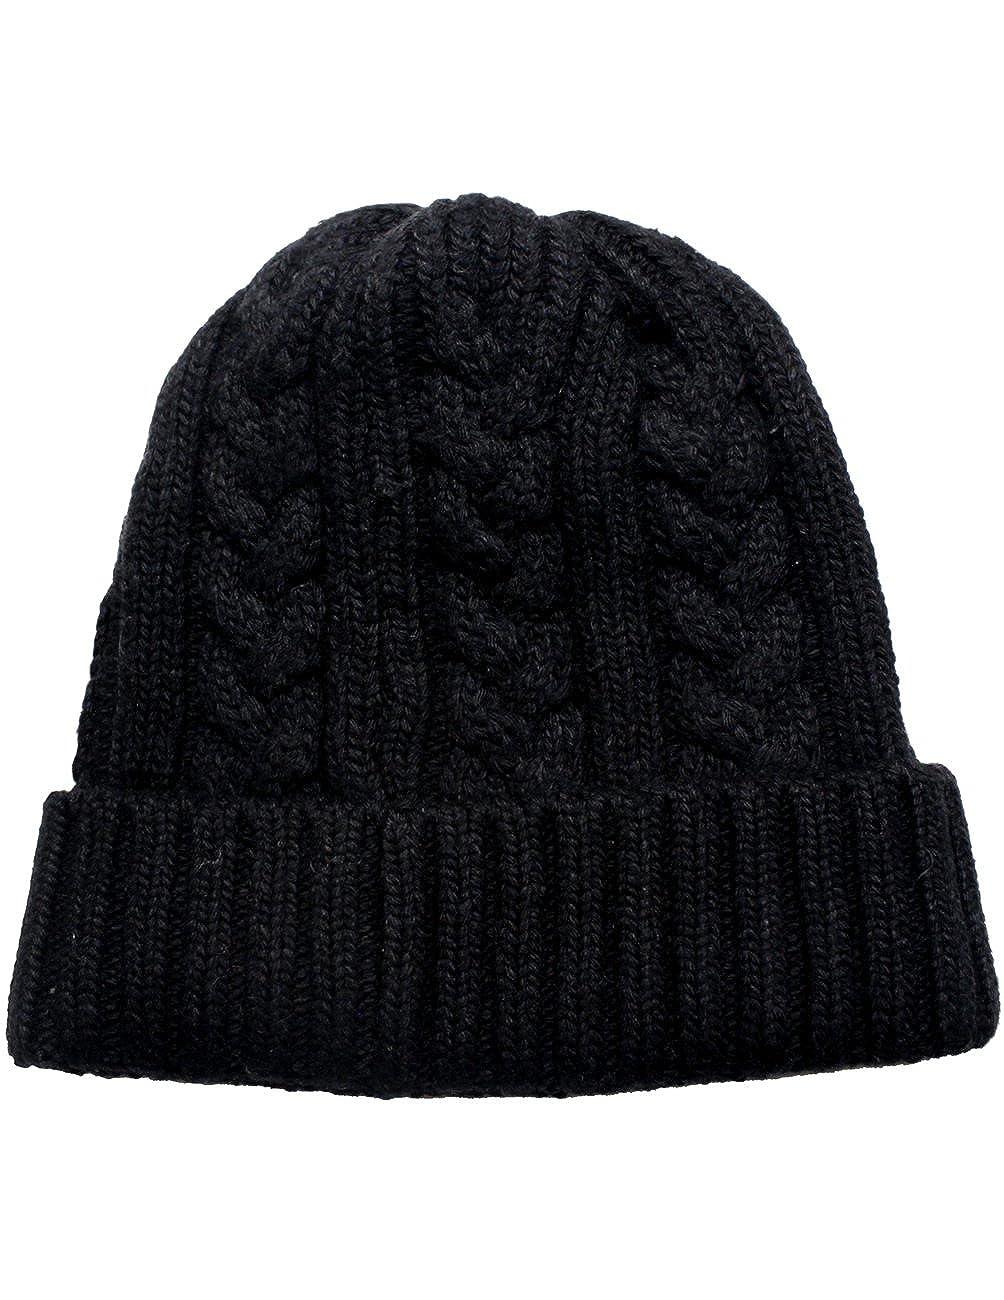 Dahlia Men s Cable Knit Beanie 1a2bb8e4845